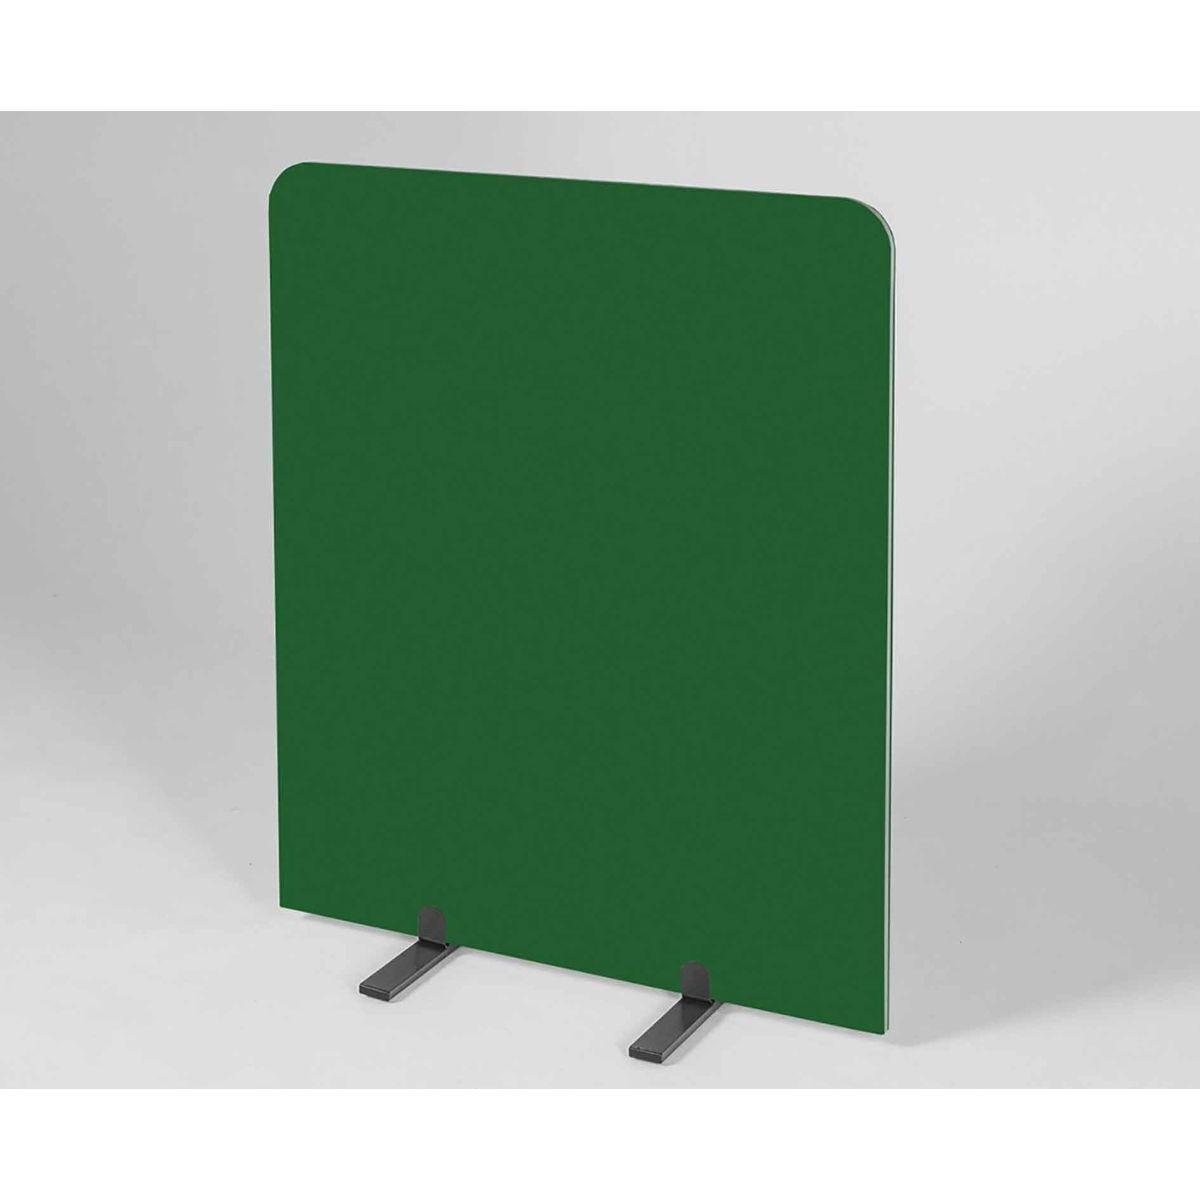 Metroplan BusyScreen Curve Screen 1450 x 1200mm Emerald